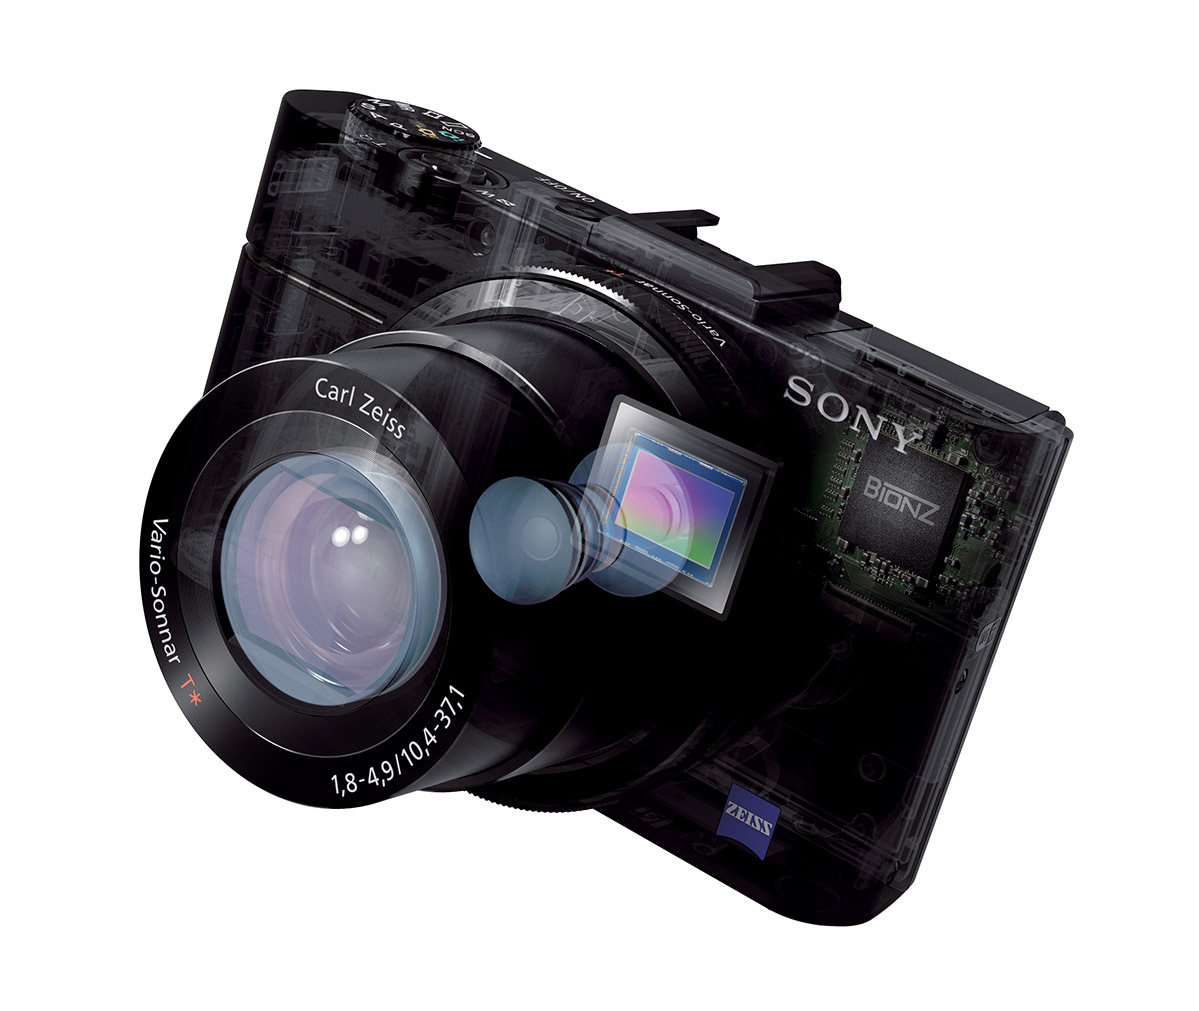 Sony Cybershot RX100 II - Cutaway View